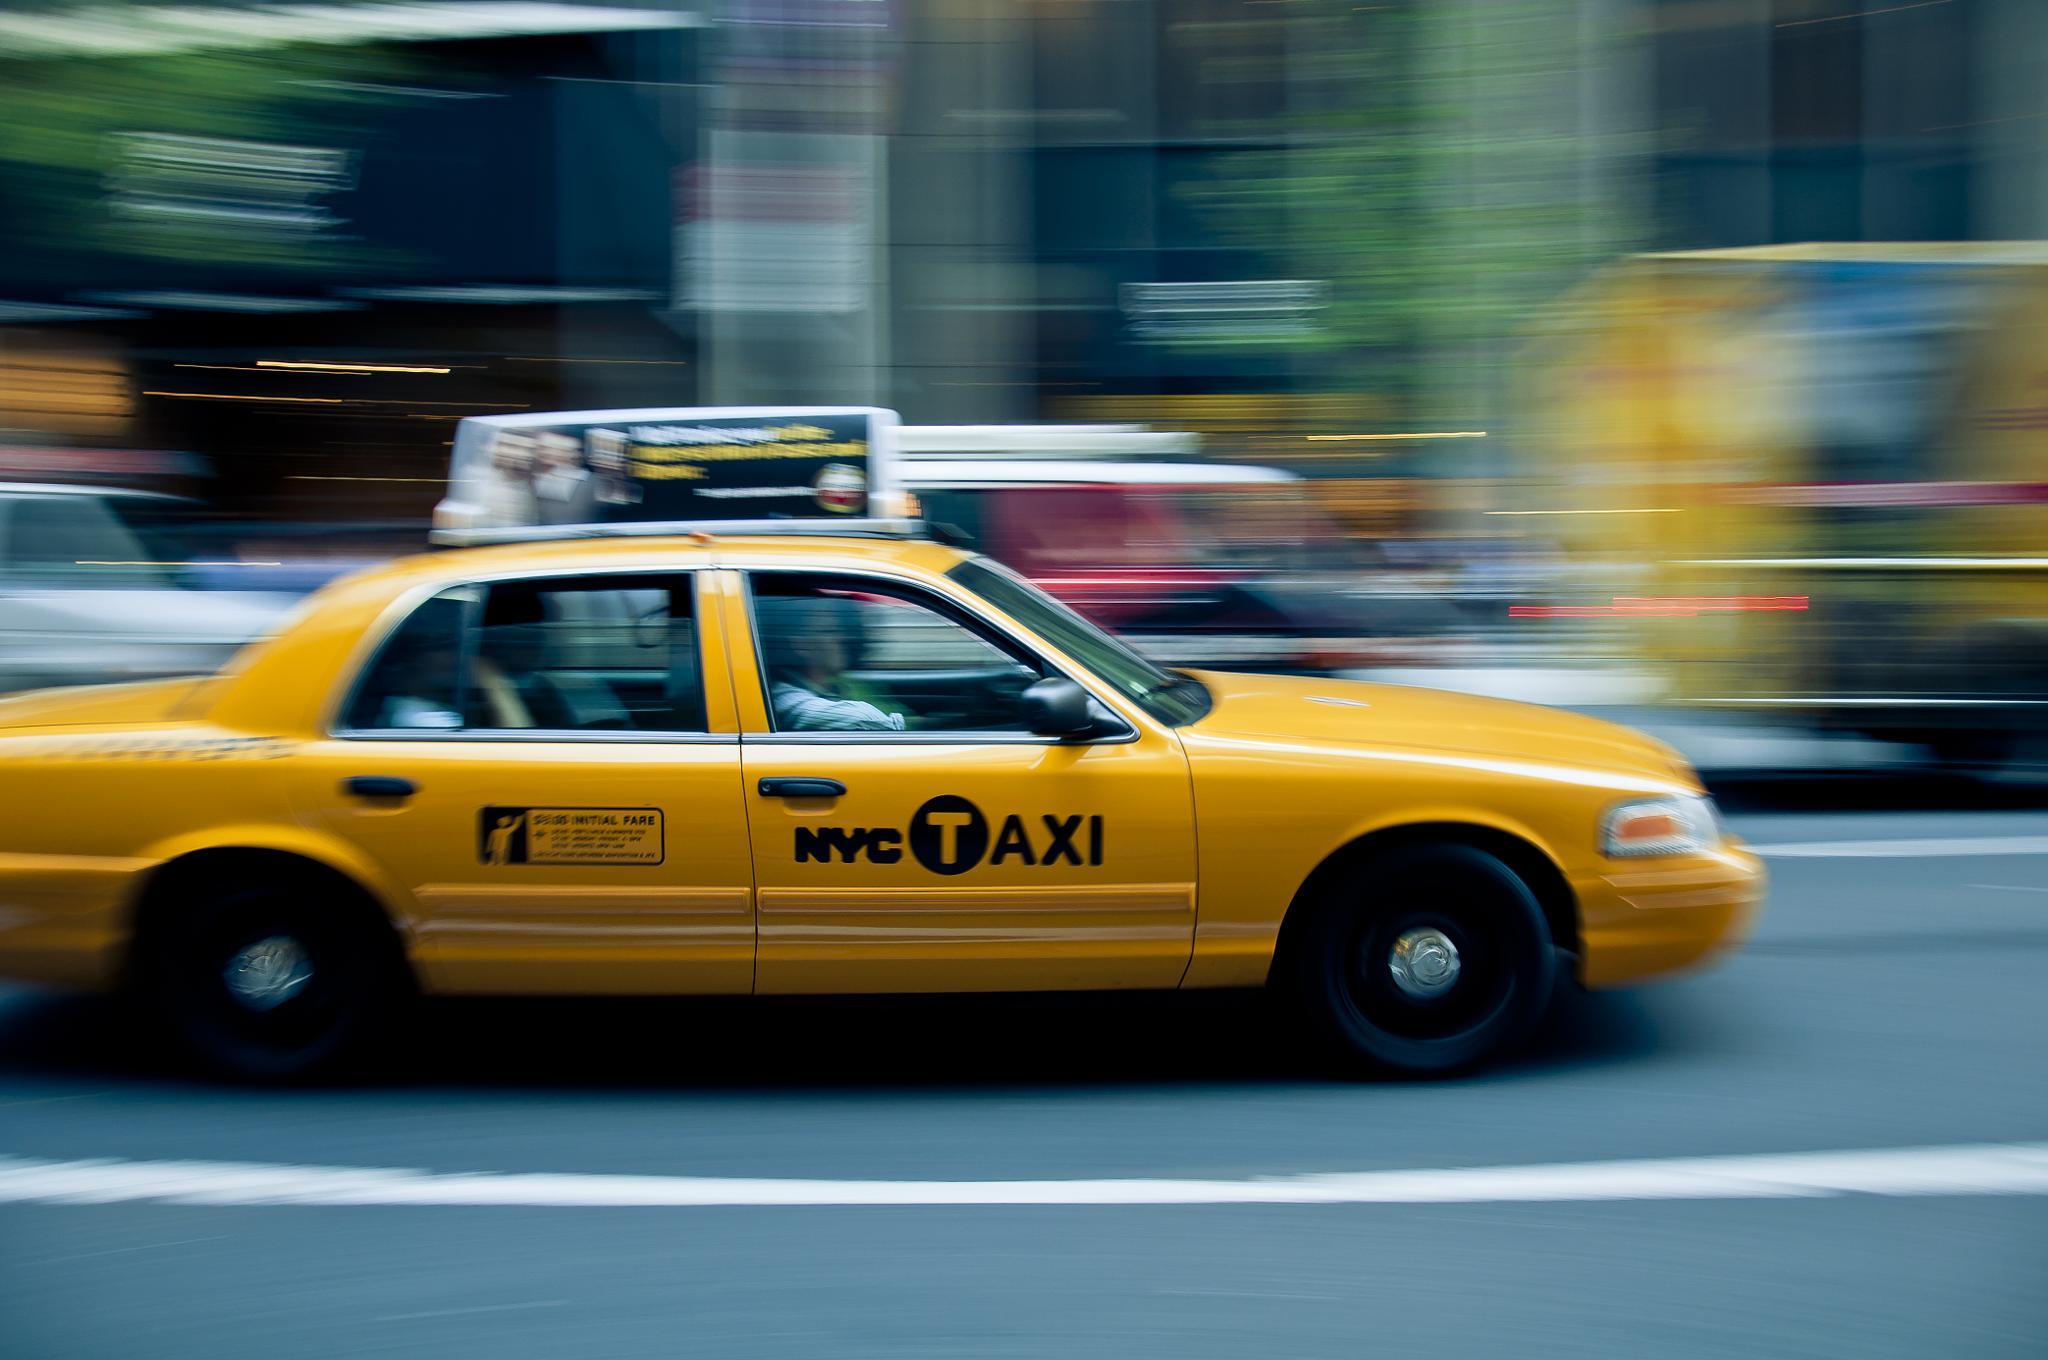 Yellow cab by Matt Chlodnicki